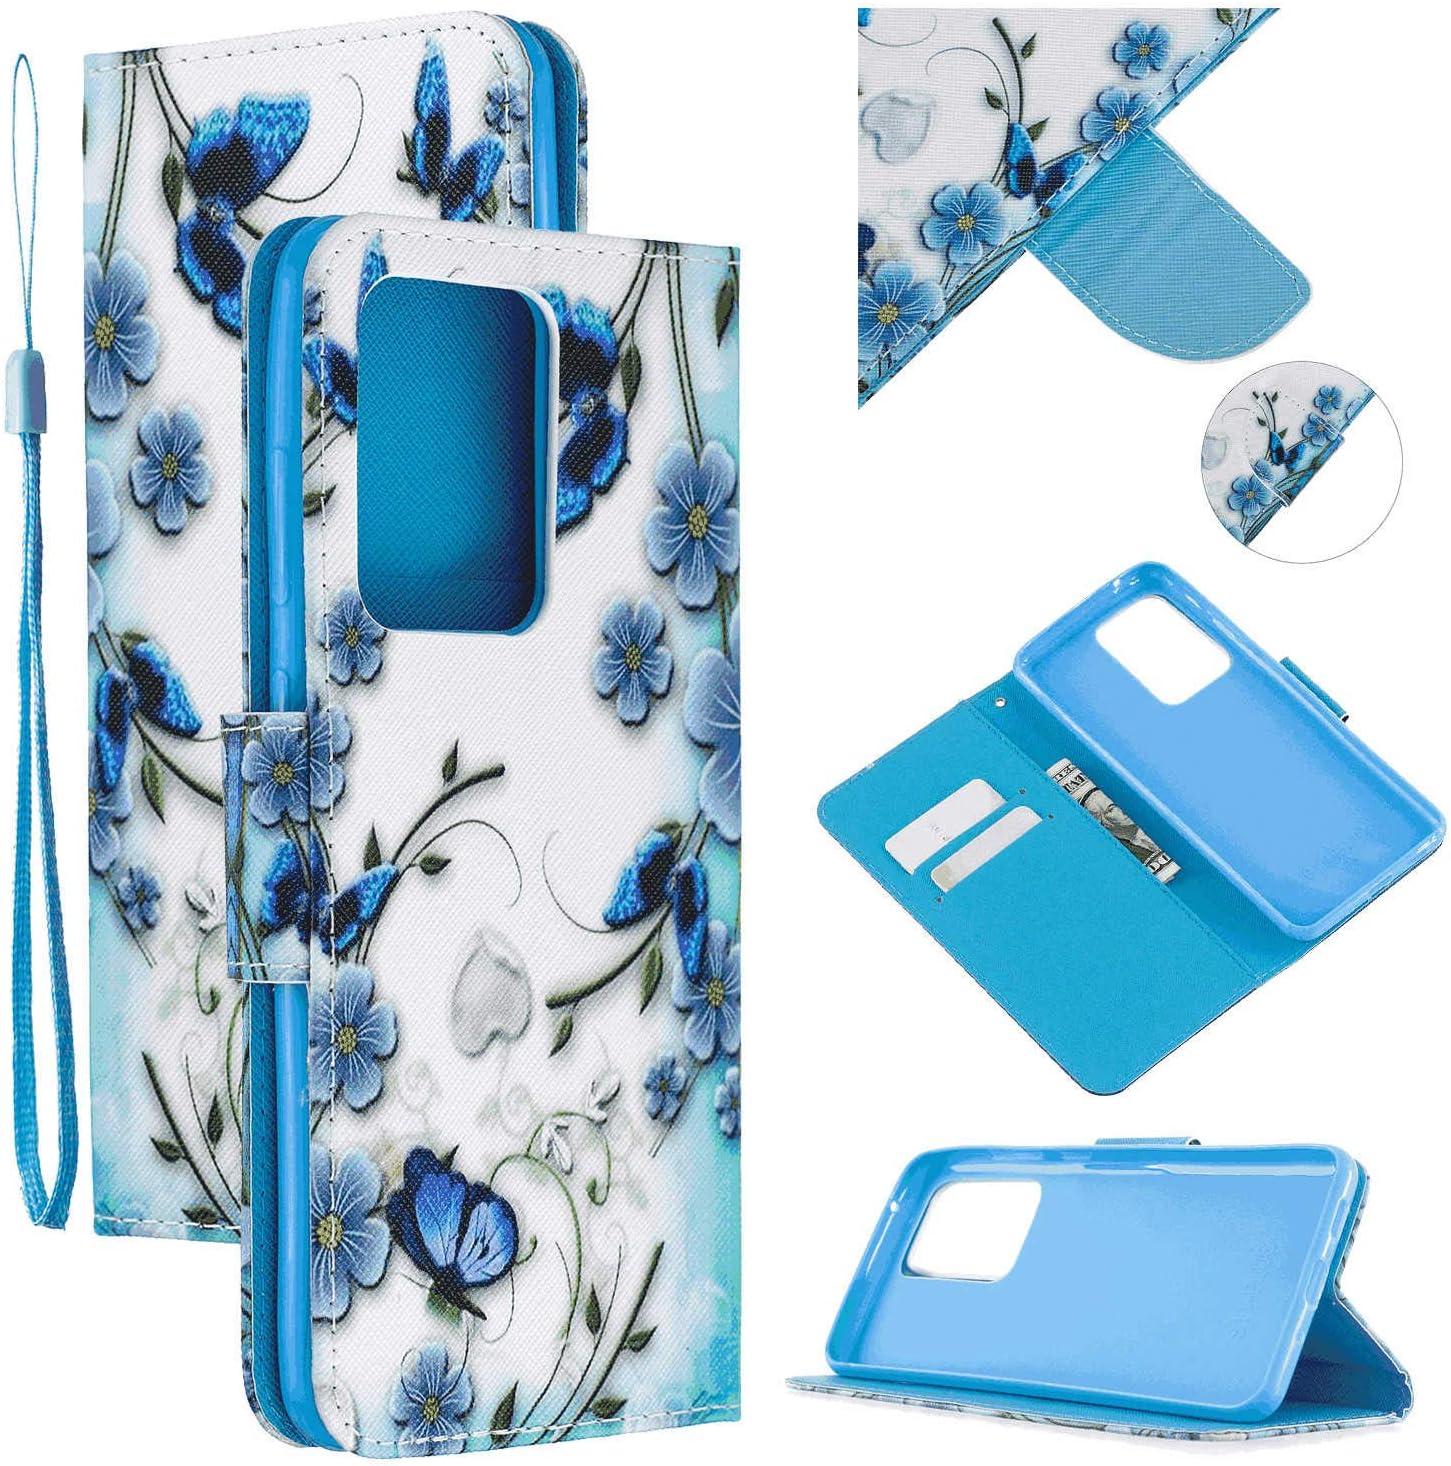 flower3 Wallet Case for Samsung Galaxy S10 Plus Leather Cover Compatible with Samsung Galaxy S10 Plus